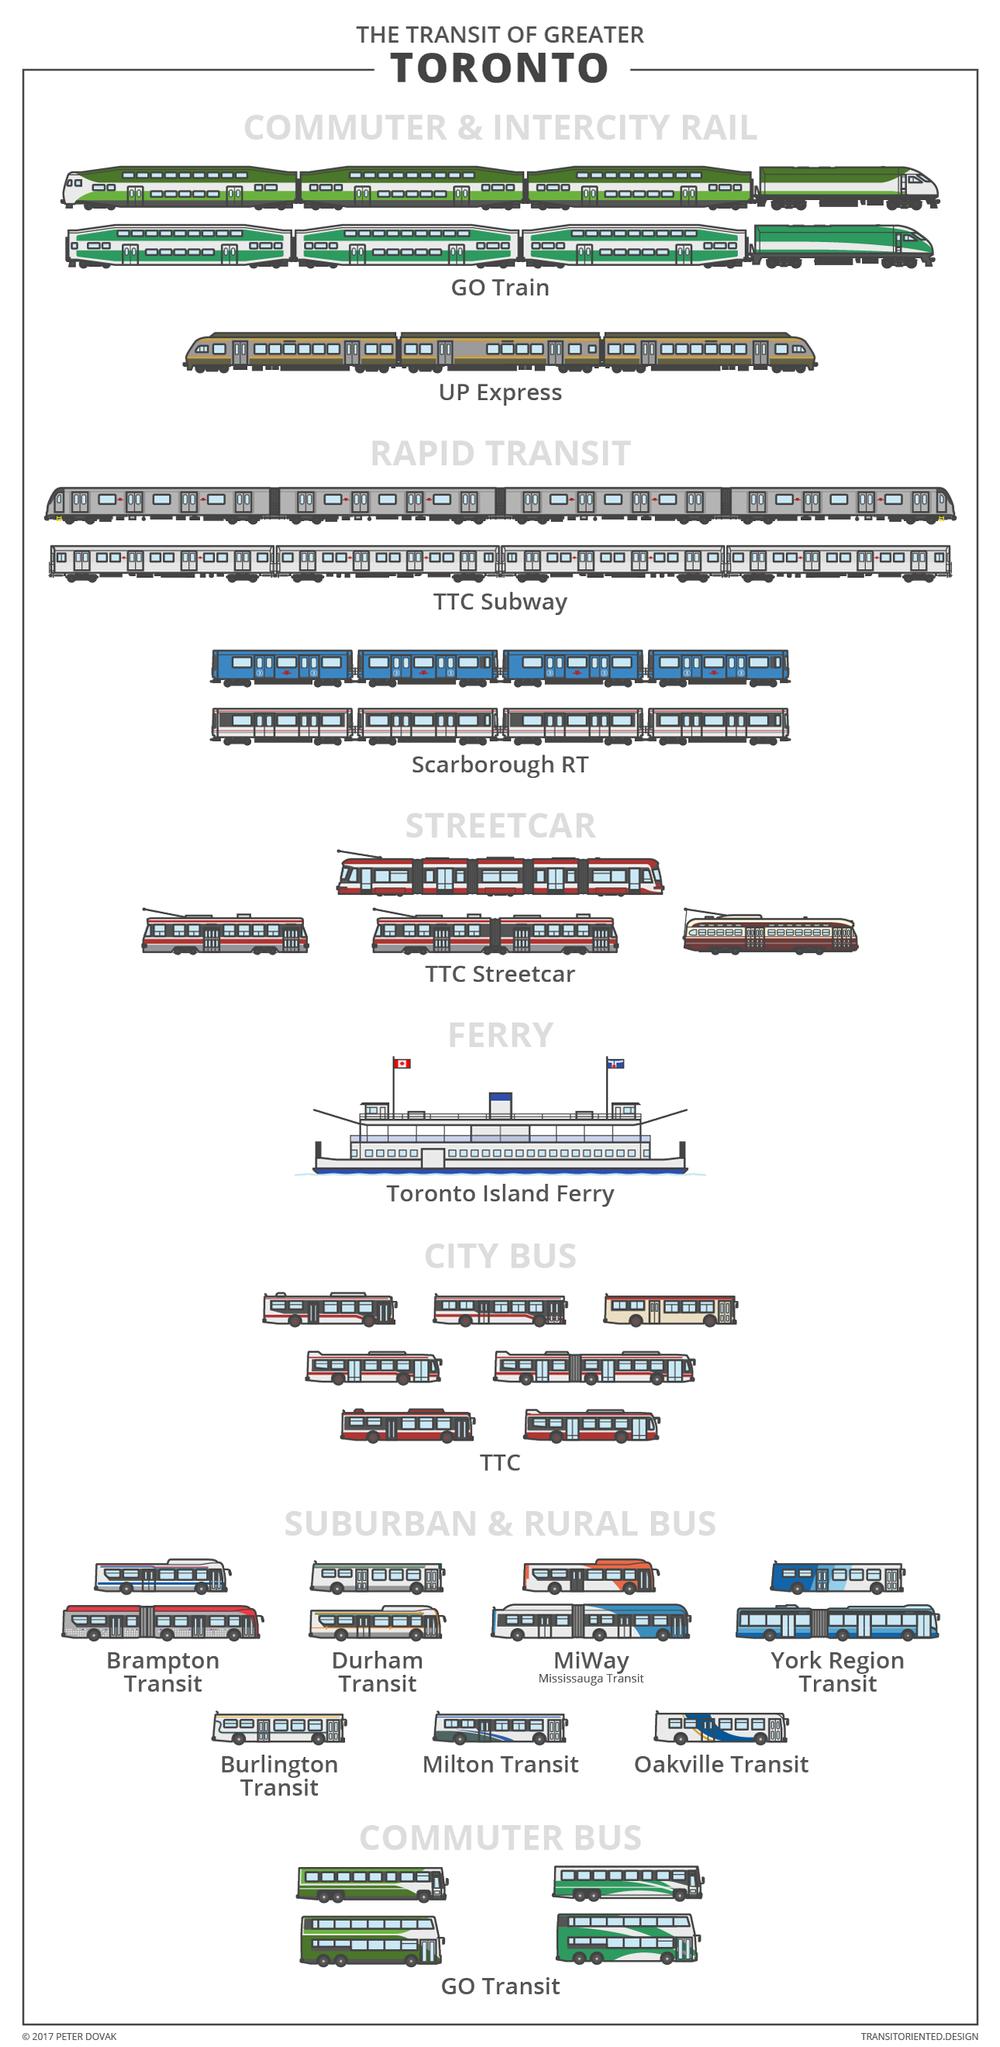 infographic-toronto.png